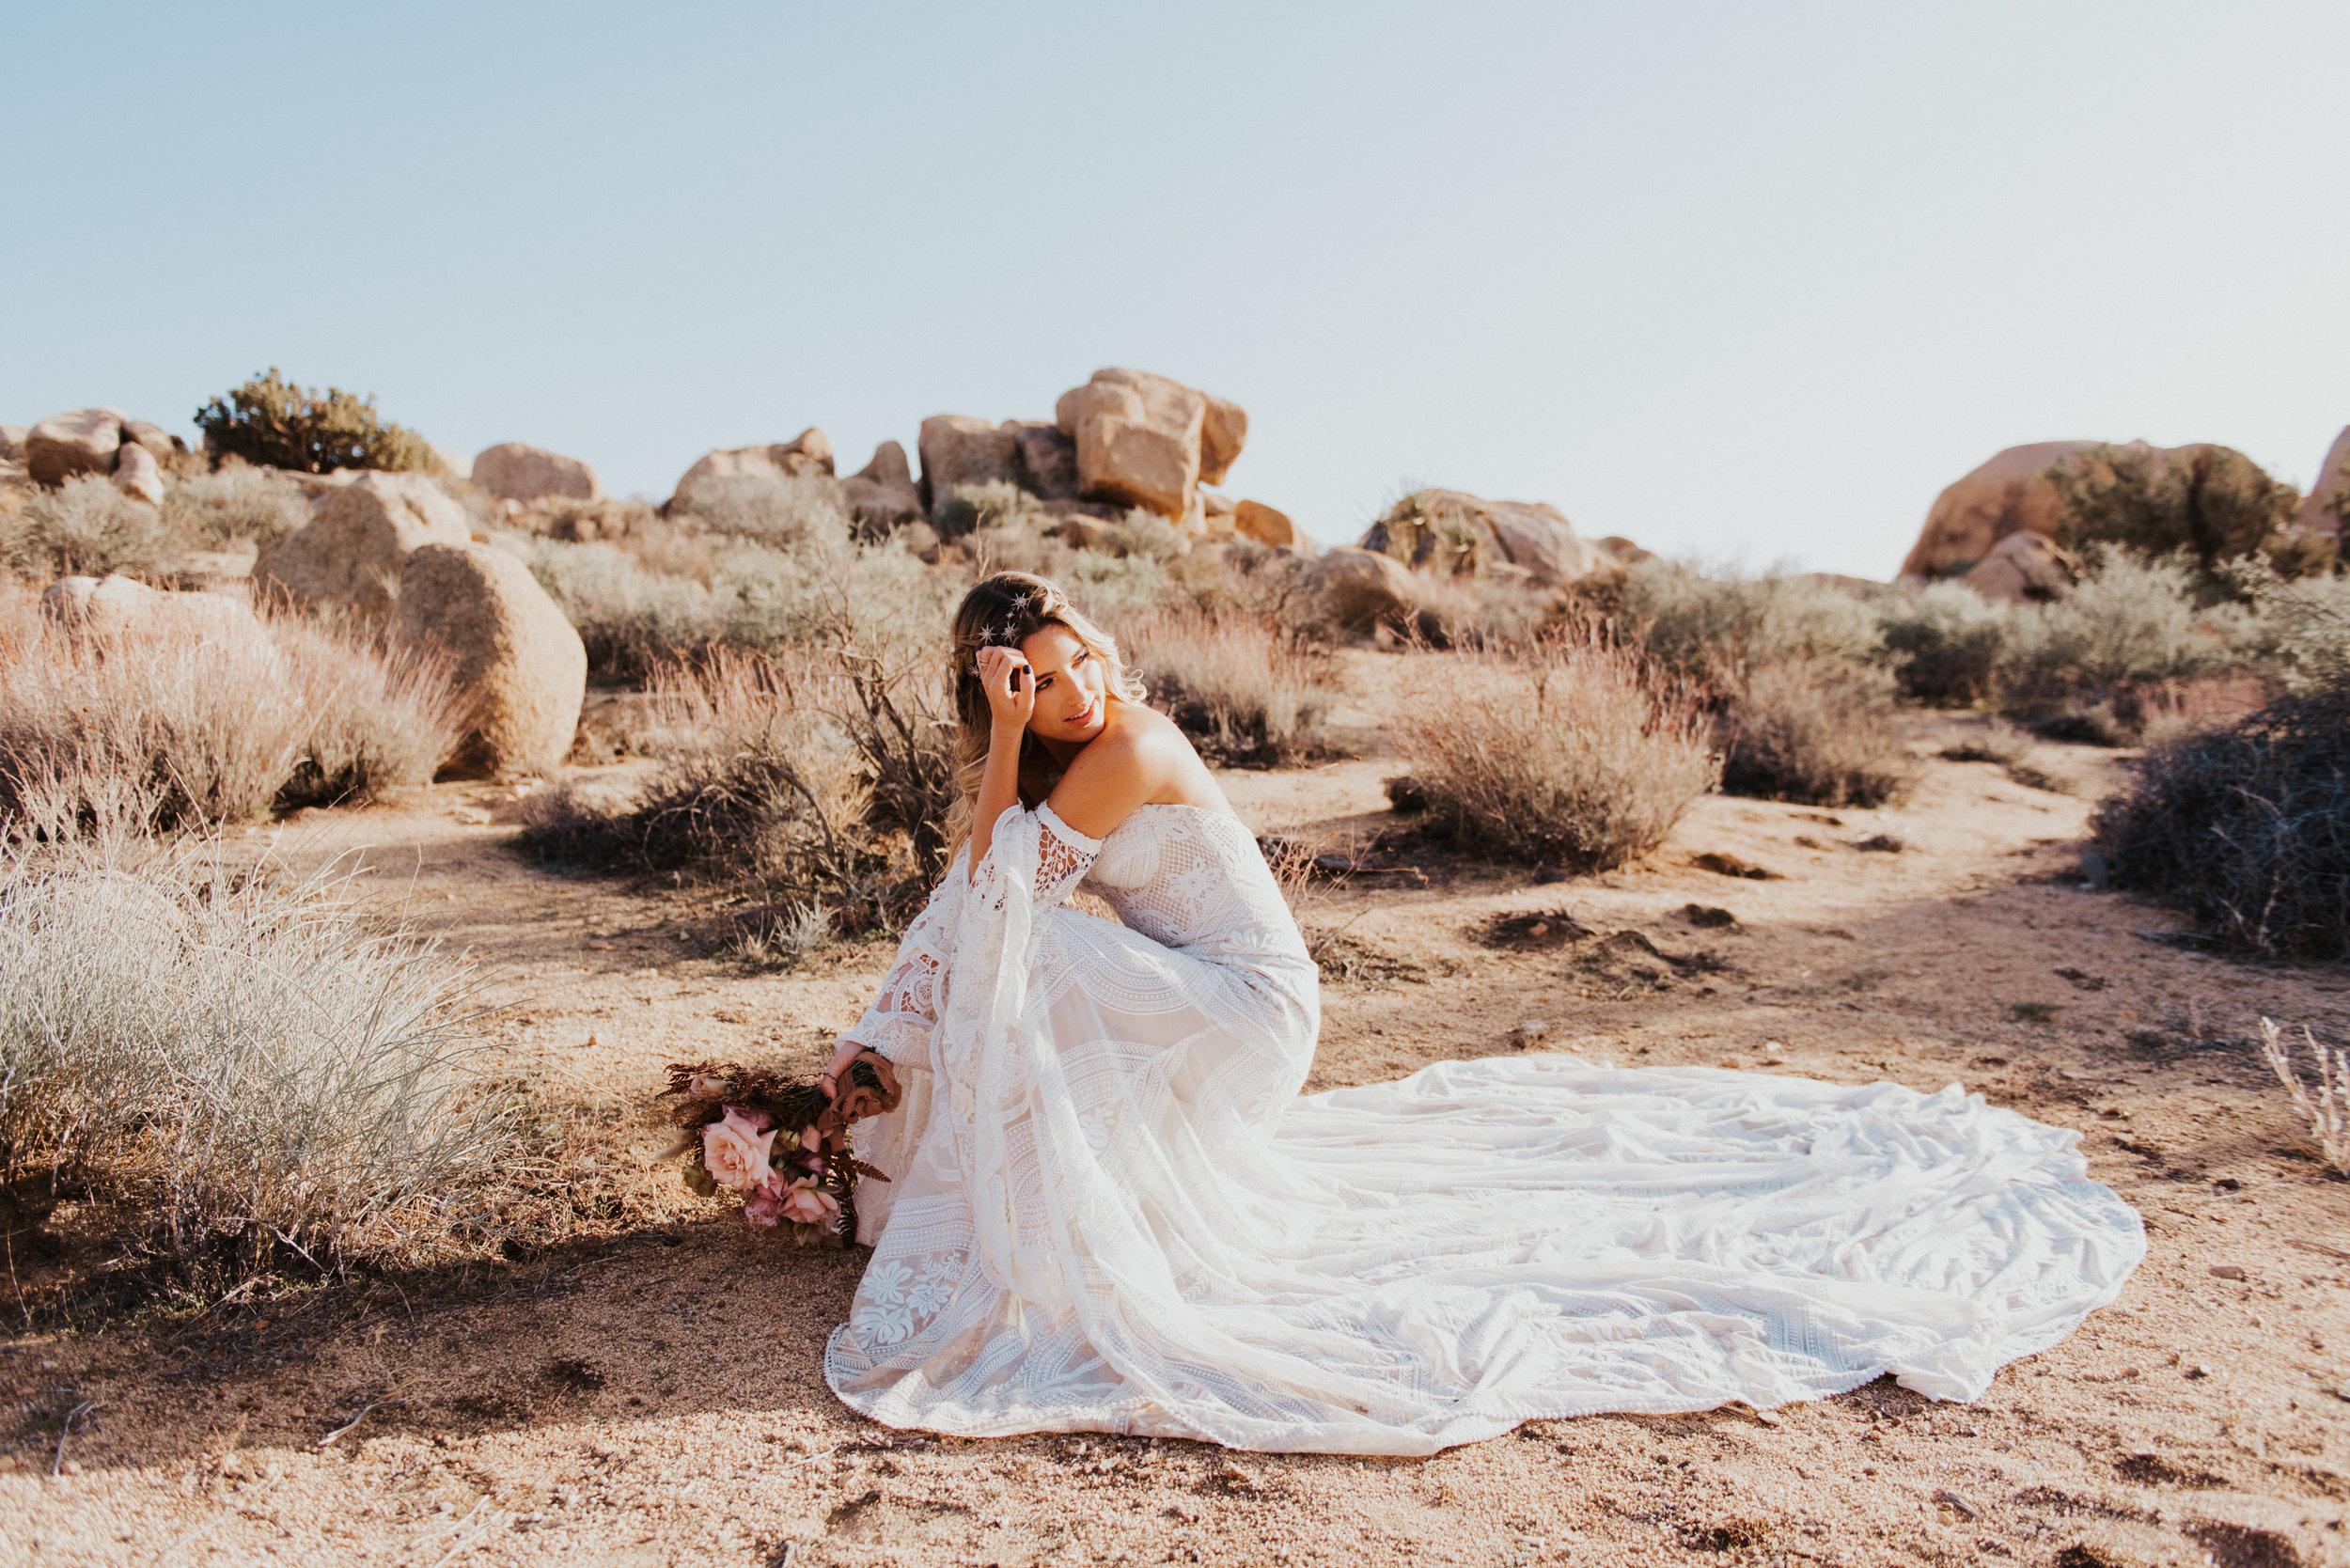 FortSt.John_photographer_TyraEPhotography_Wedding_Couple_Family_Photograhy_DawsonCreek_Elopement_Bride_Boduoir_Portraits-4975.jpg